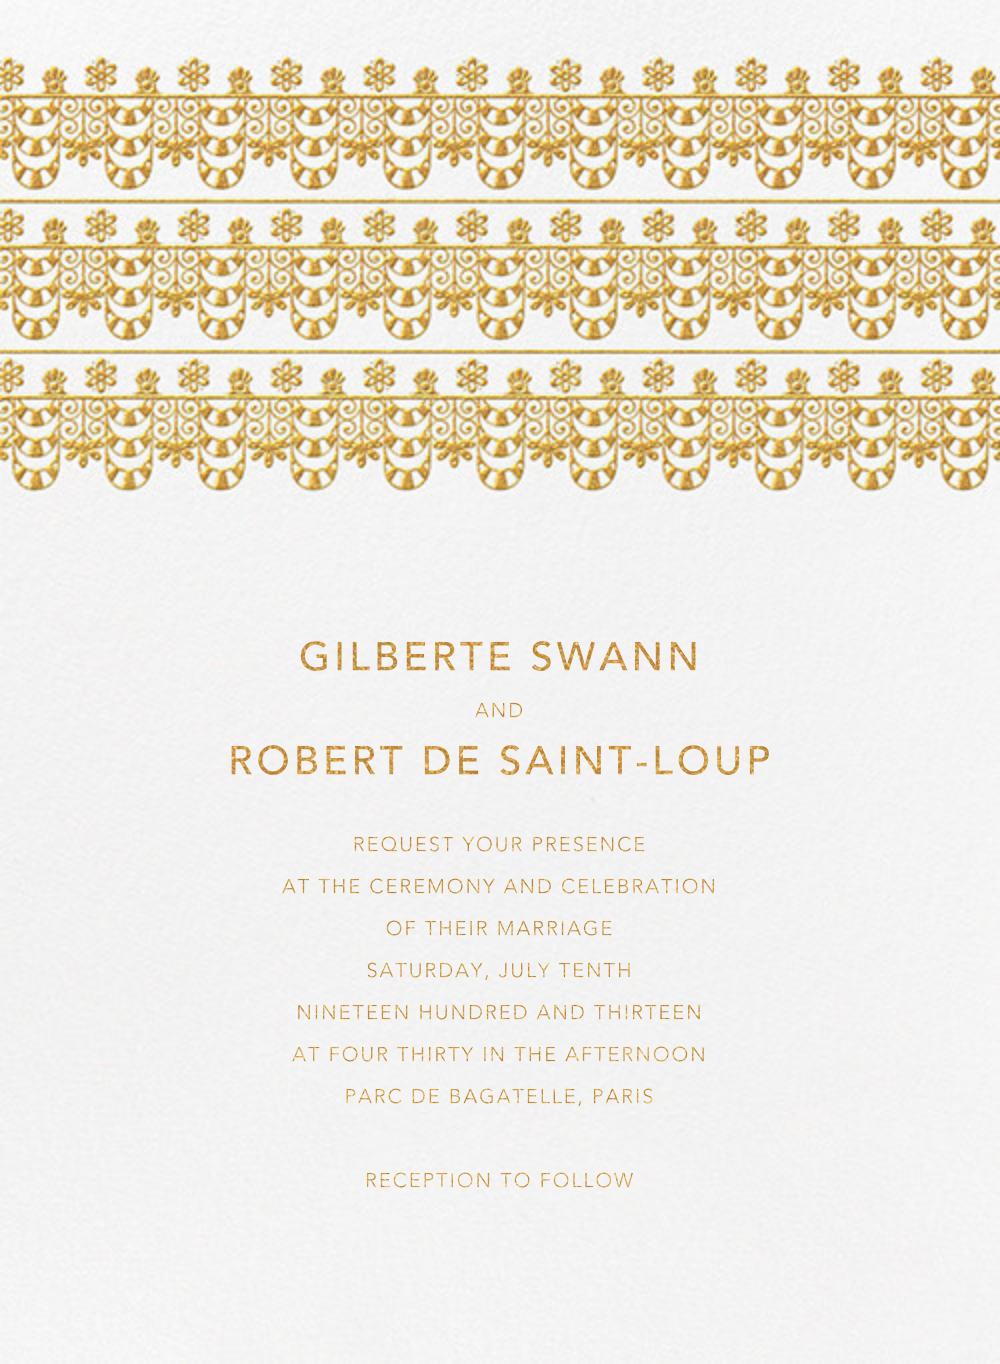 Van Alen Scallop I (Invitation) - Oscar de la Renta